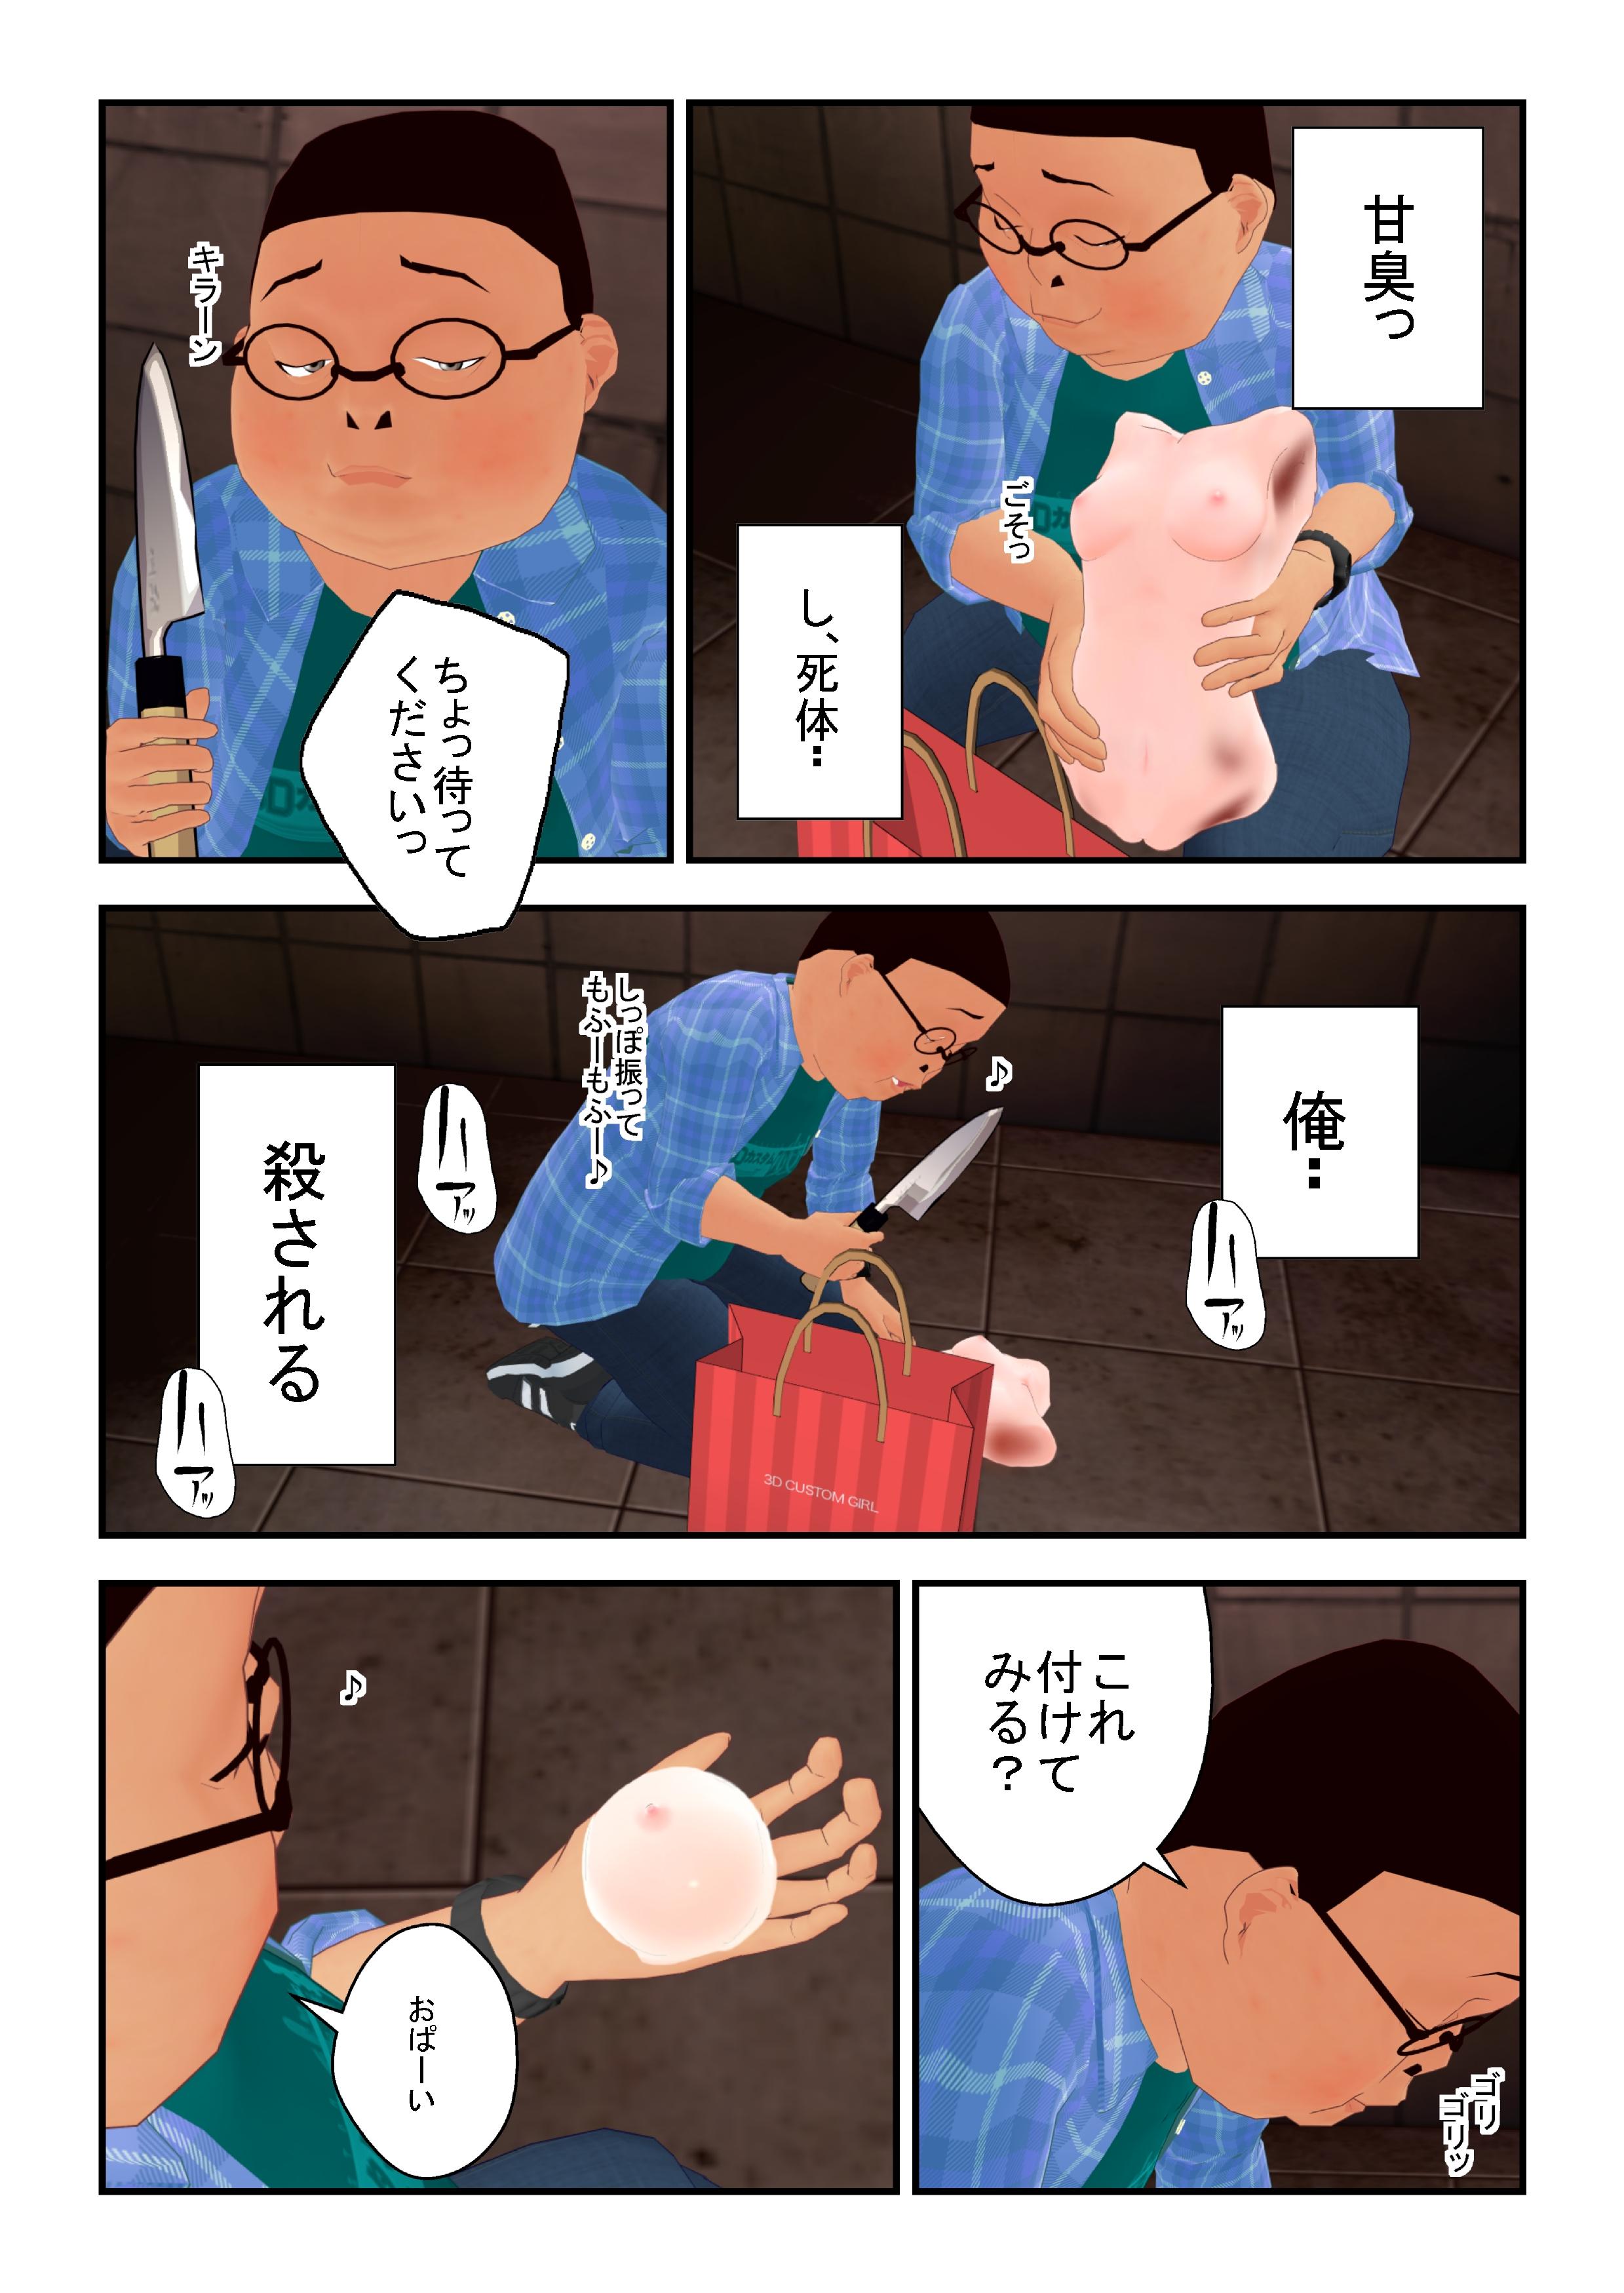 muteki_0007_2.jpg